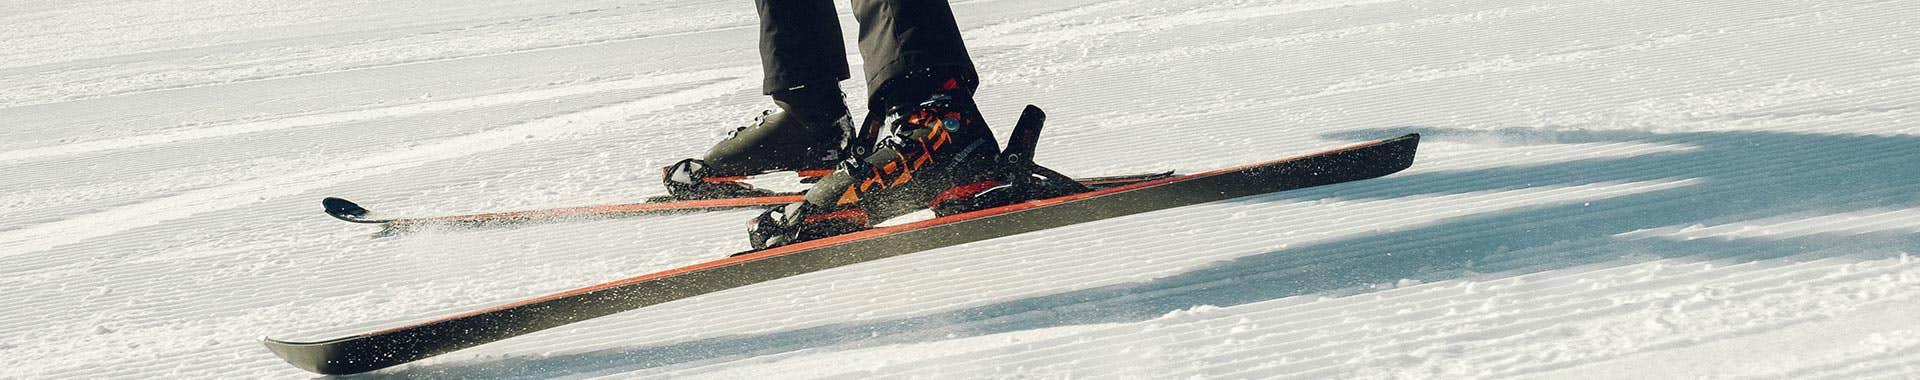 All ski boots